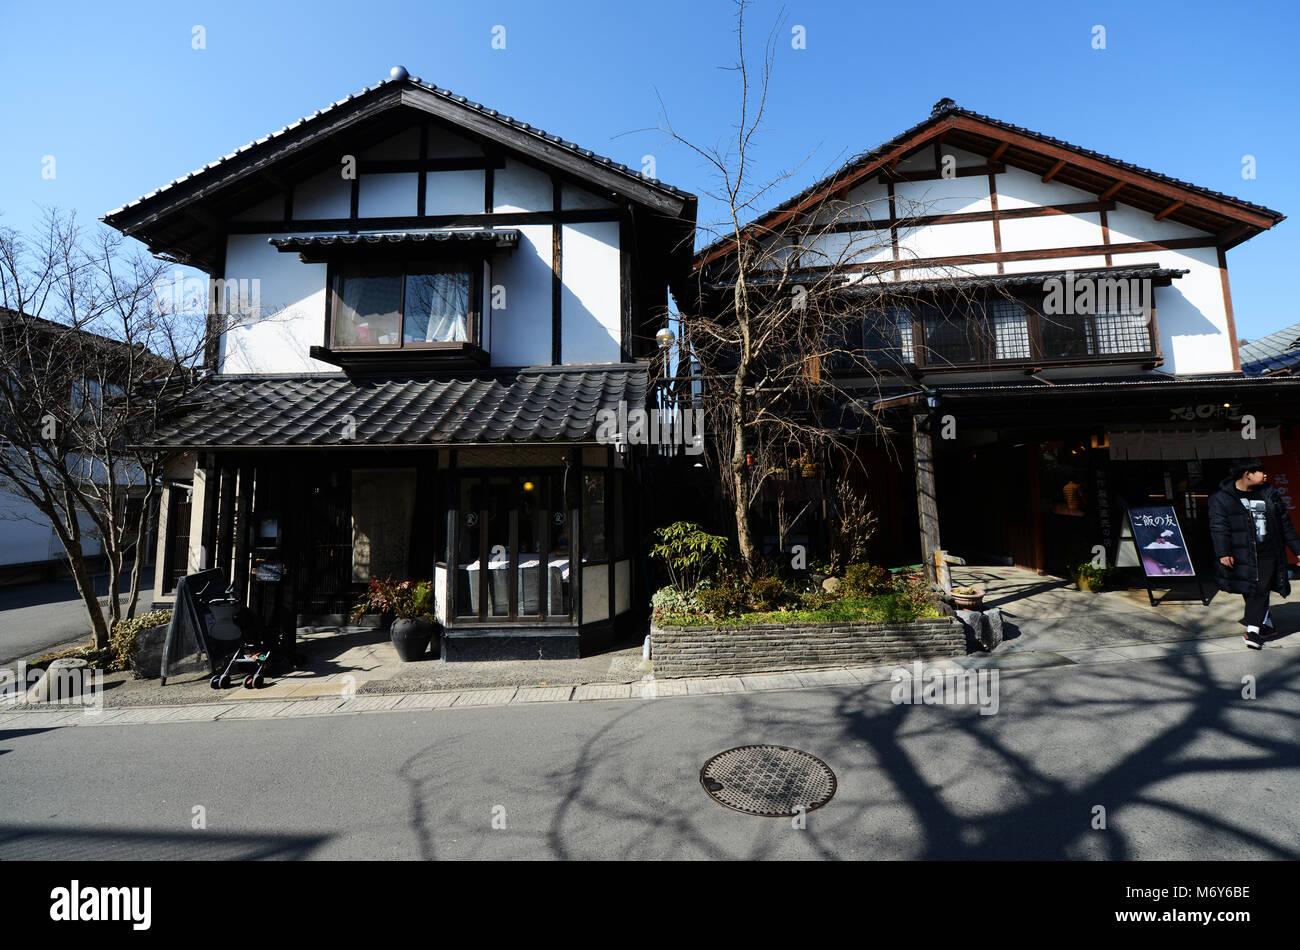 Beautiful Japanese houses on Yunotsubo Kaidō street in Yufu. - Stock Image & Japanese Houses Stock Photos \u0026 Japanese Houses Stock Images - Alamy